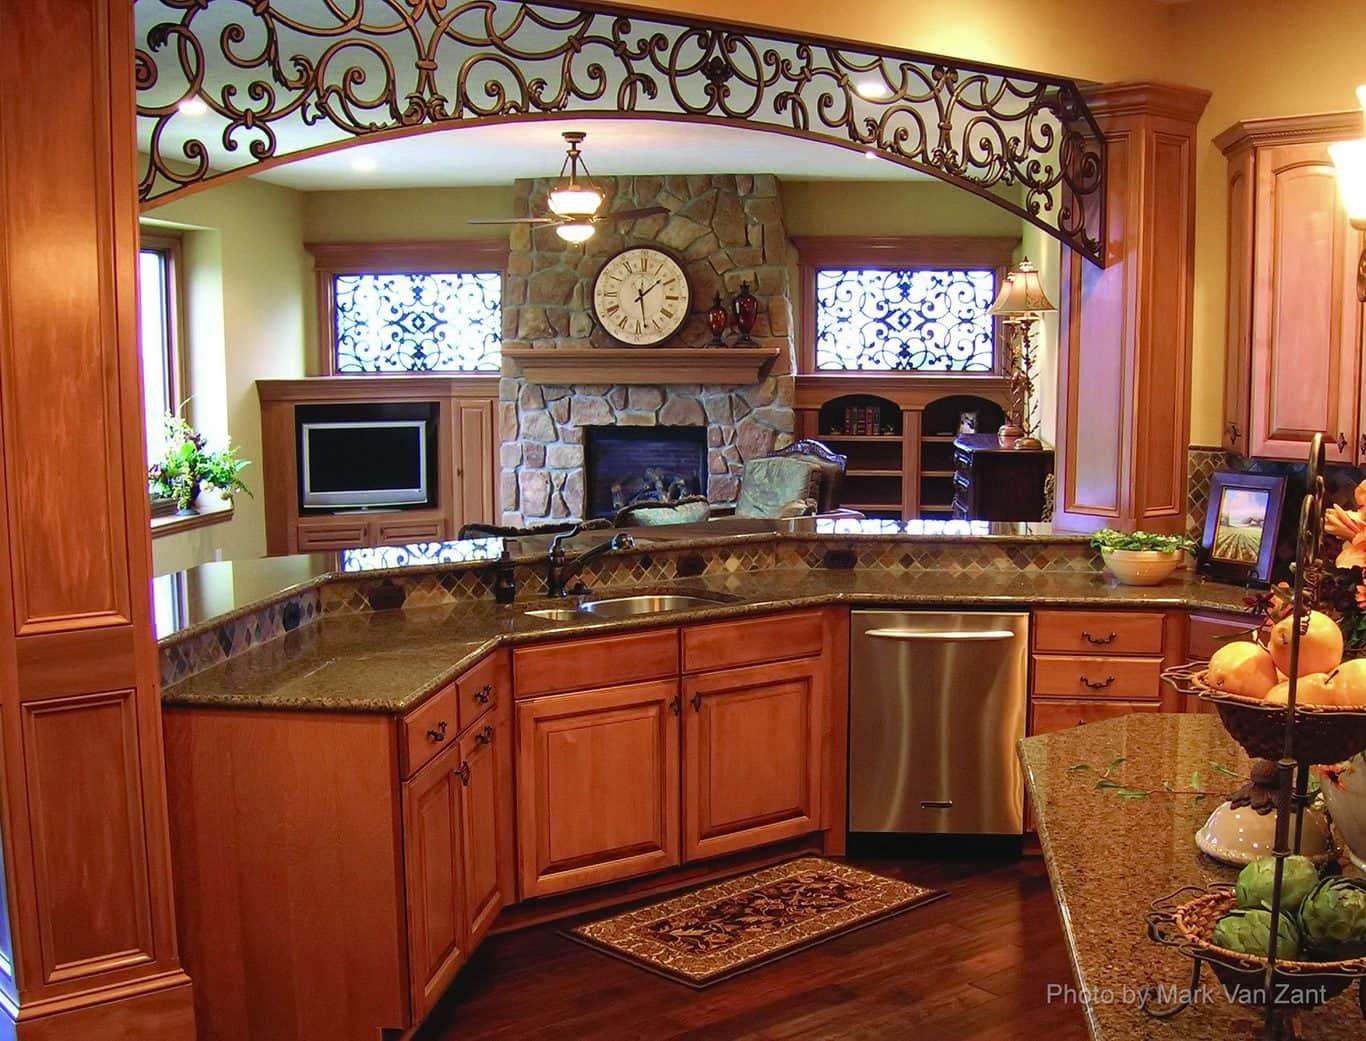 tableaux-decorative-grilles-residential-home-decor-interior-decorating-decorative-accent-faux-iron-firenze-039-antique-bronze-bb8-001-1366x1041.jpg